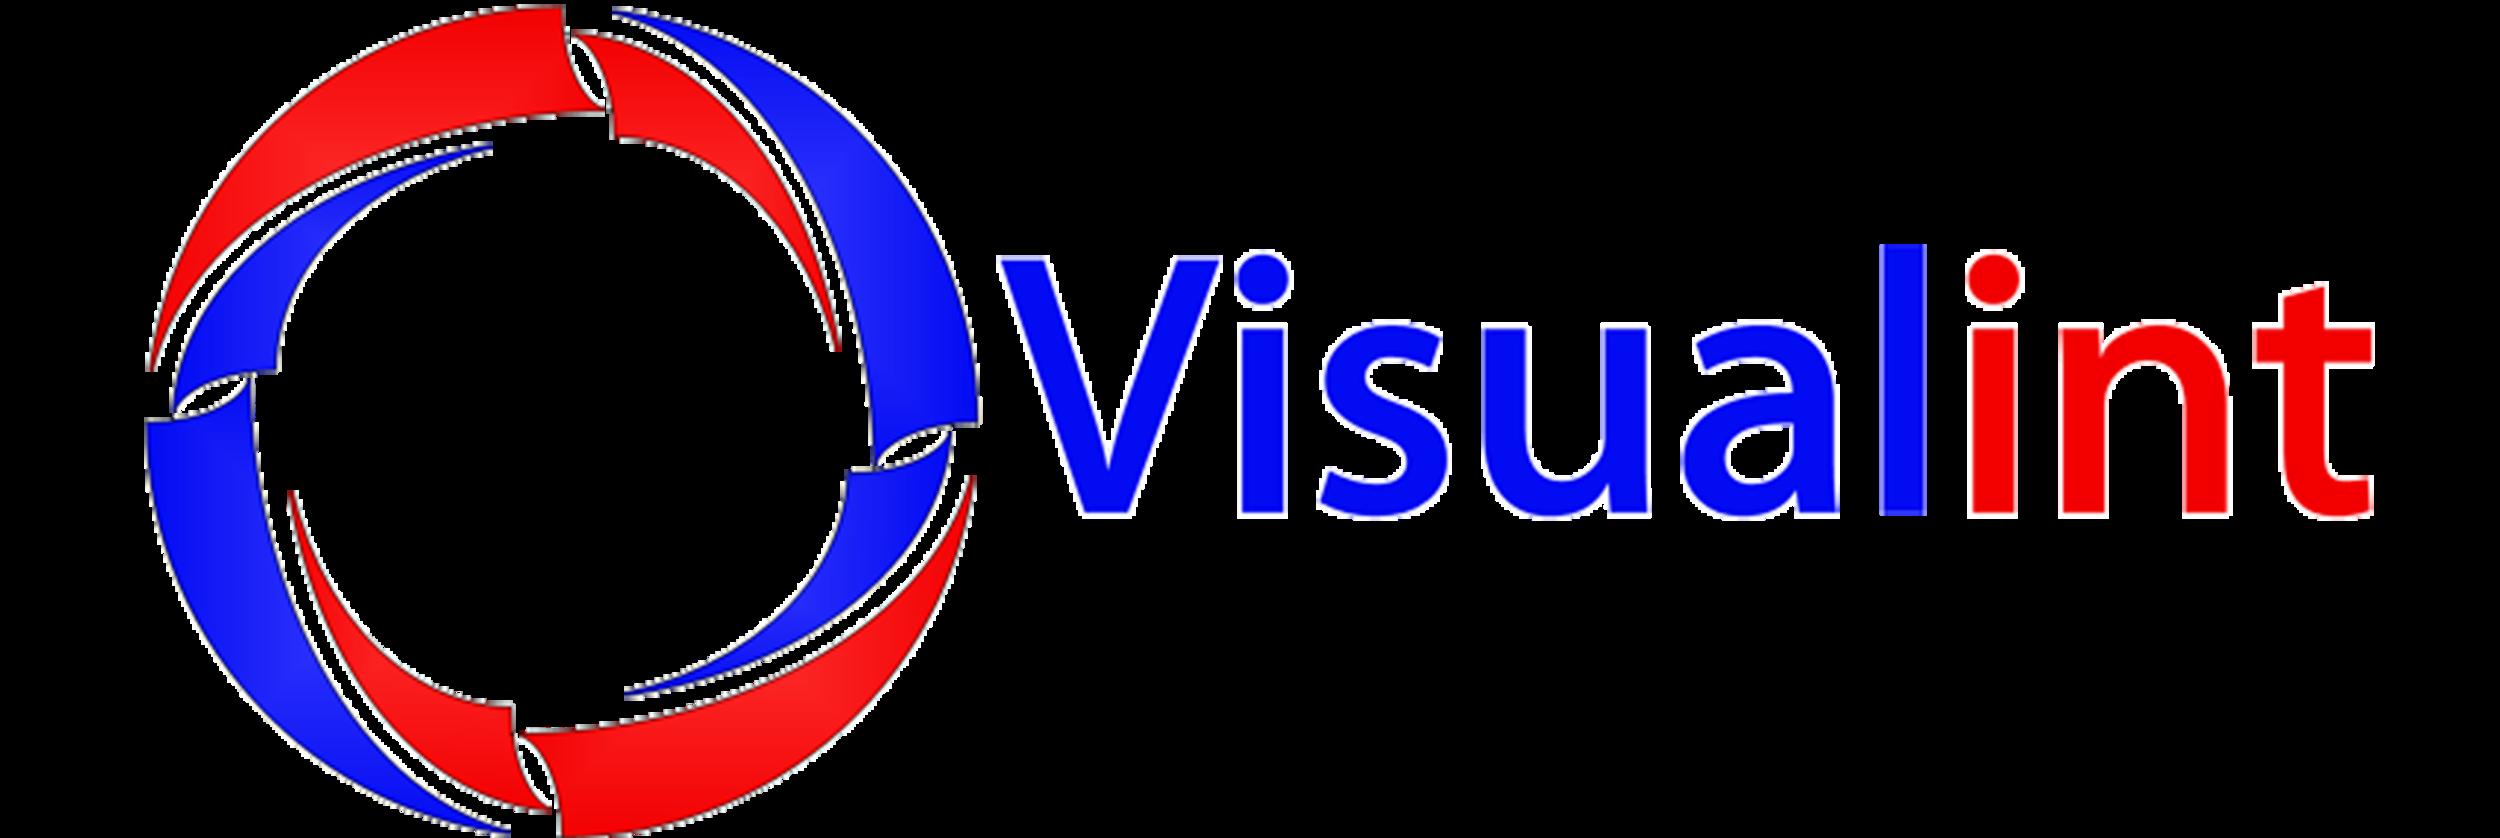 visualint png.png